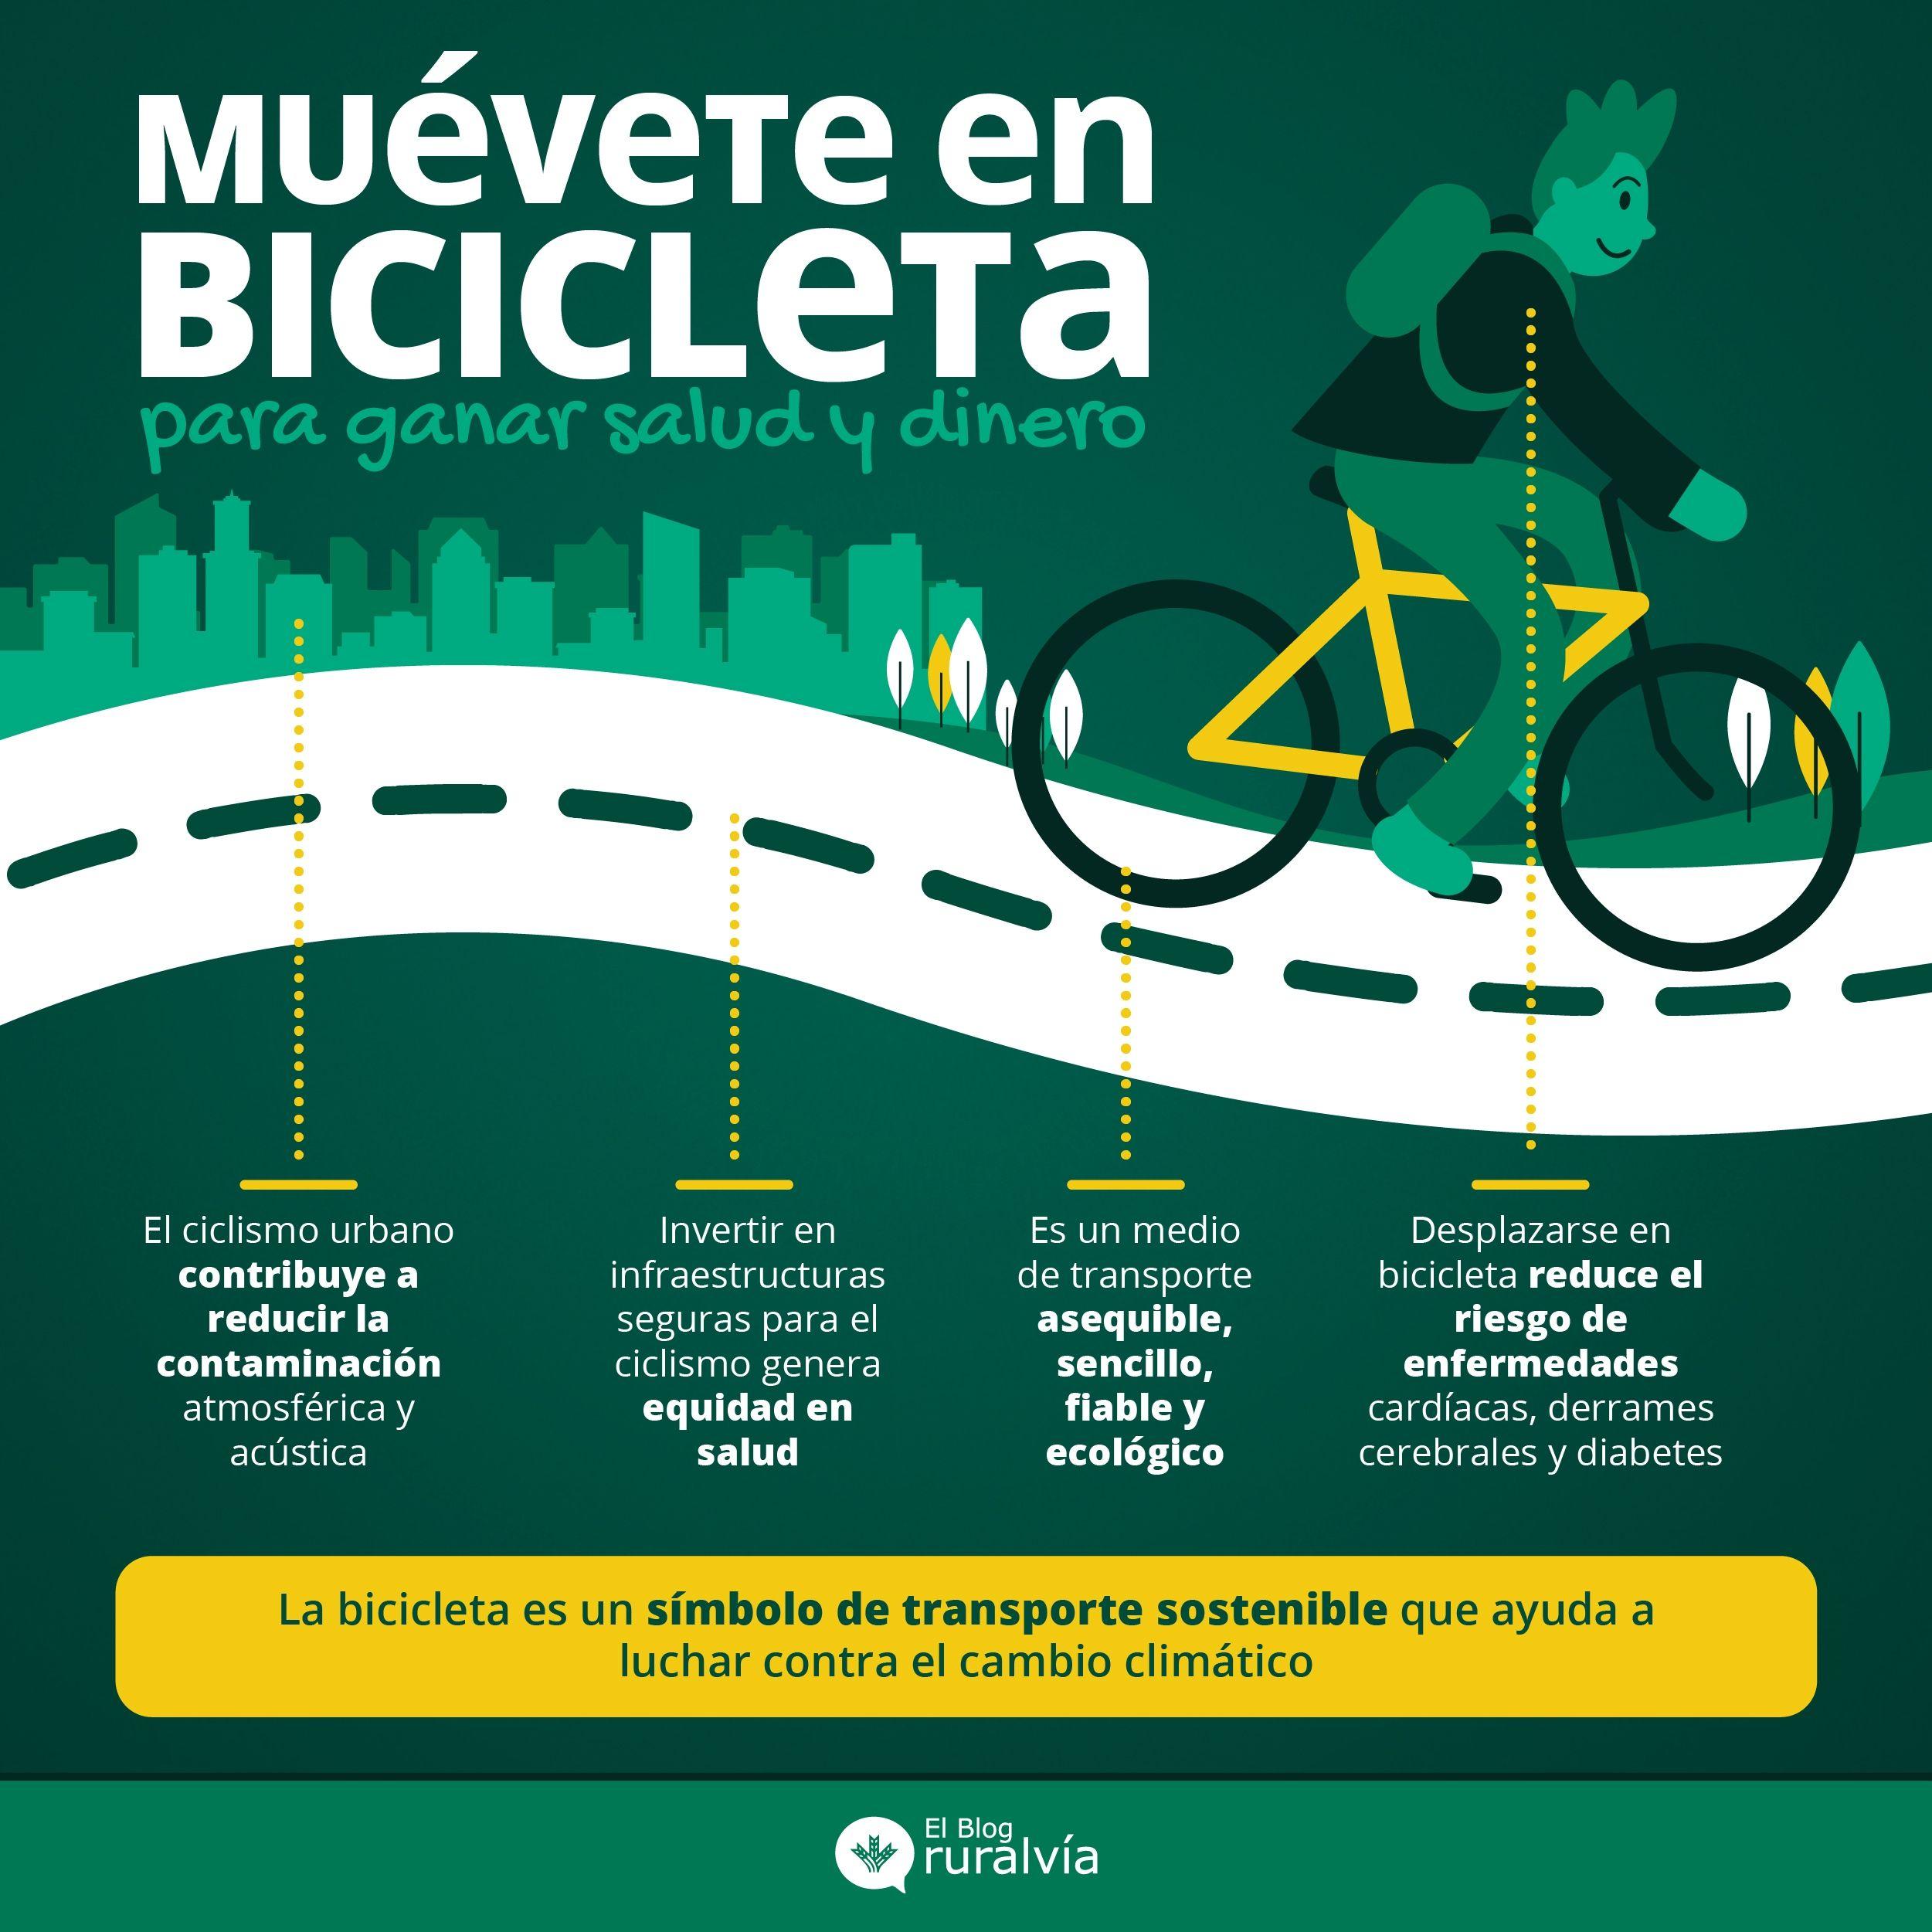 moverte-bicicleta-gana-salud-dinero